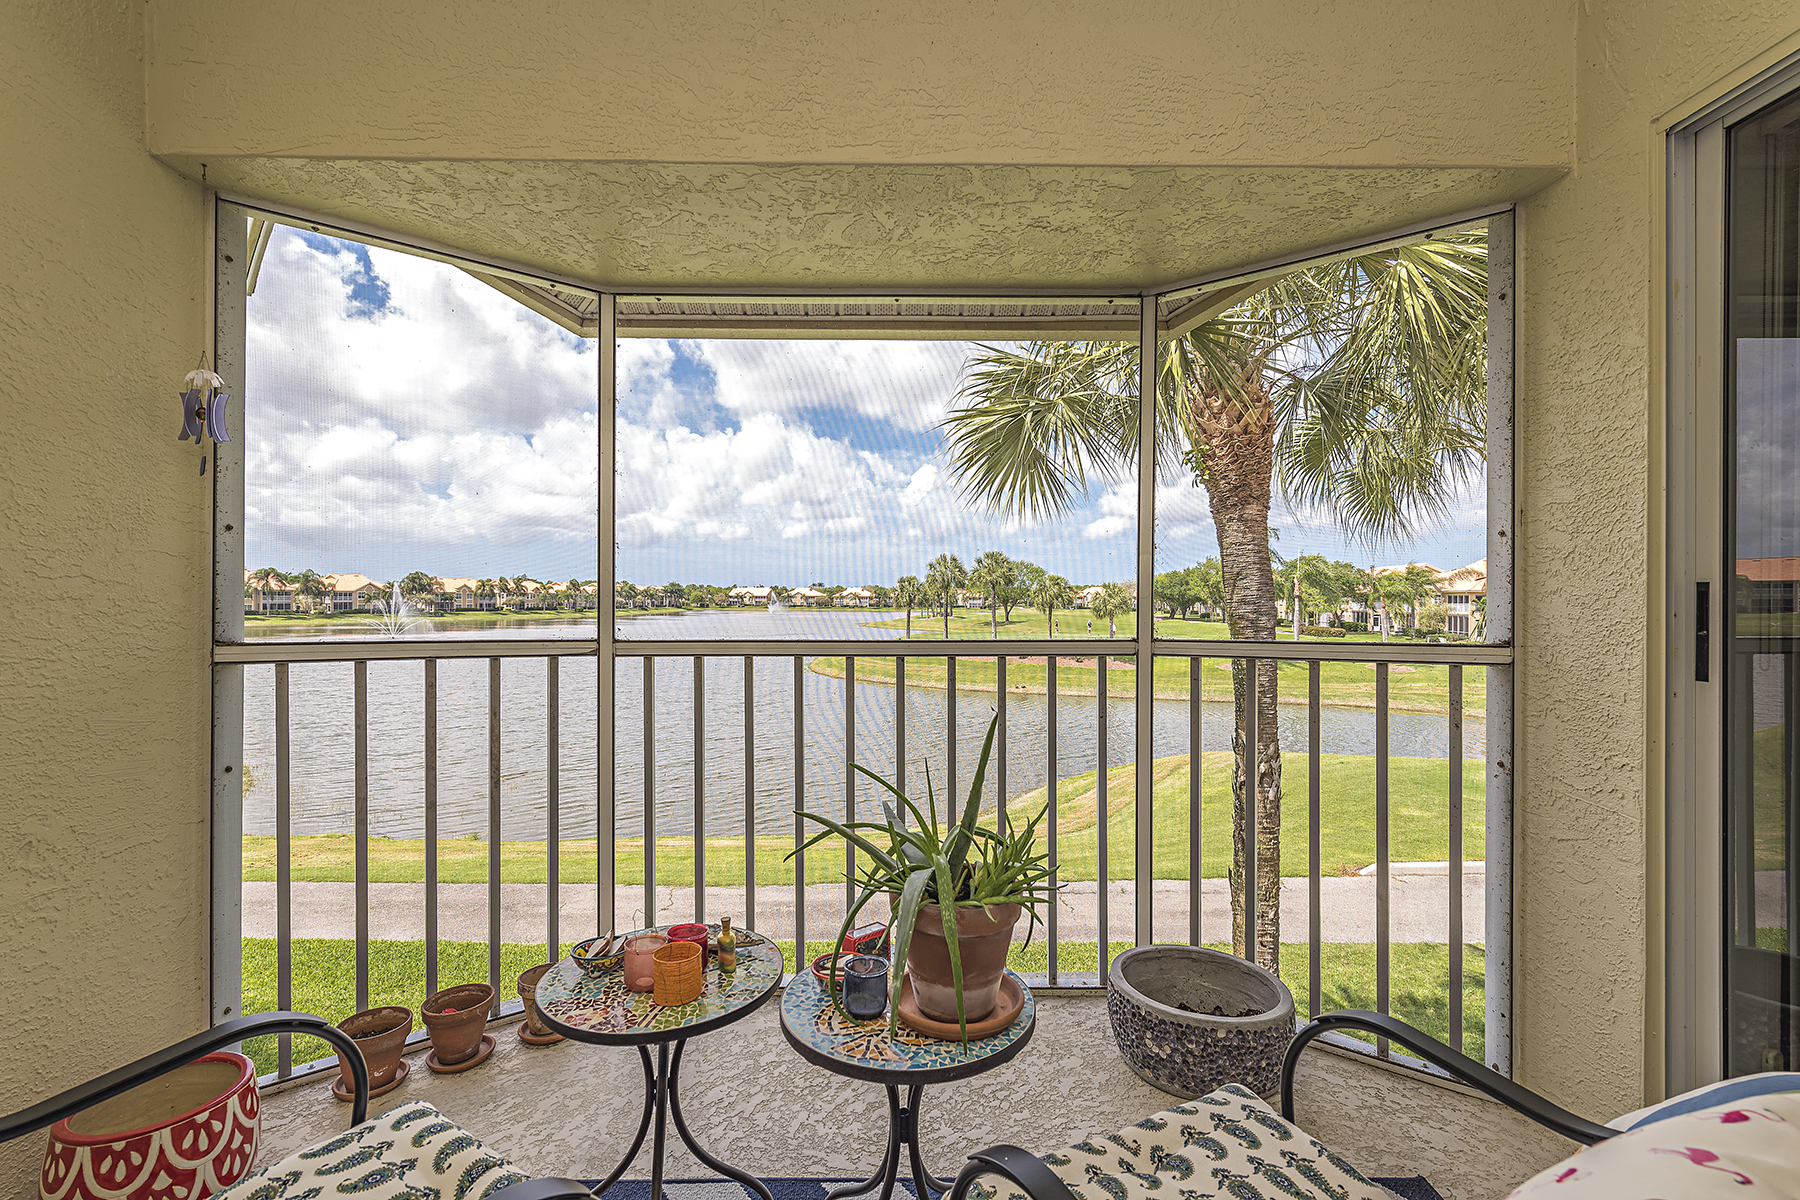 Condomínio para Venda às WORTHINGTON 28060 Cavendish Ct 2508 Bonita Springs, Florida, 34135 Estados Unidos